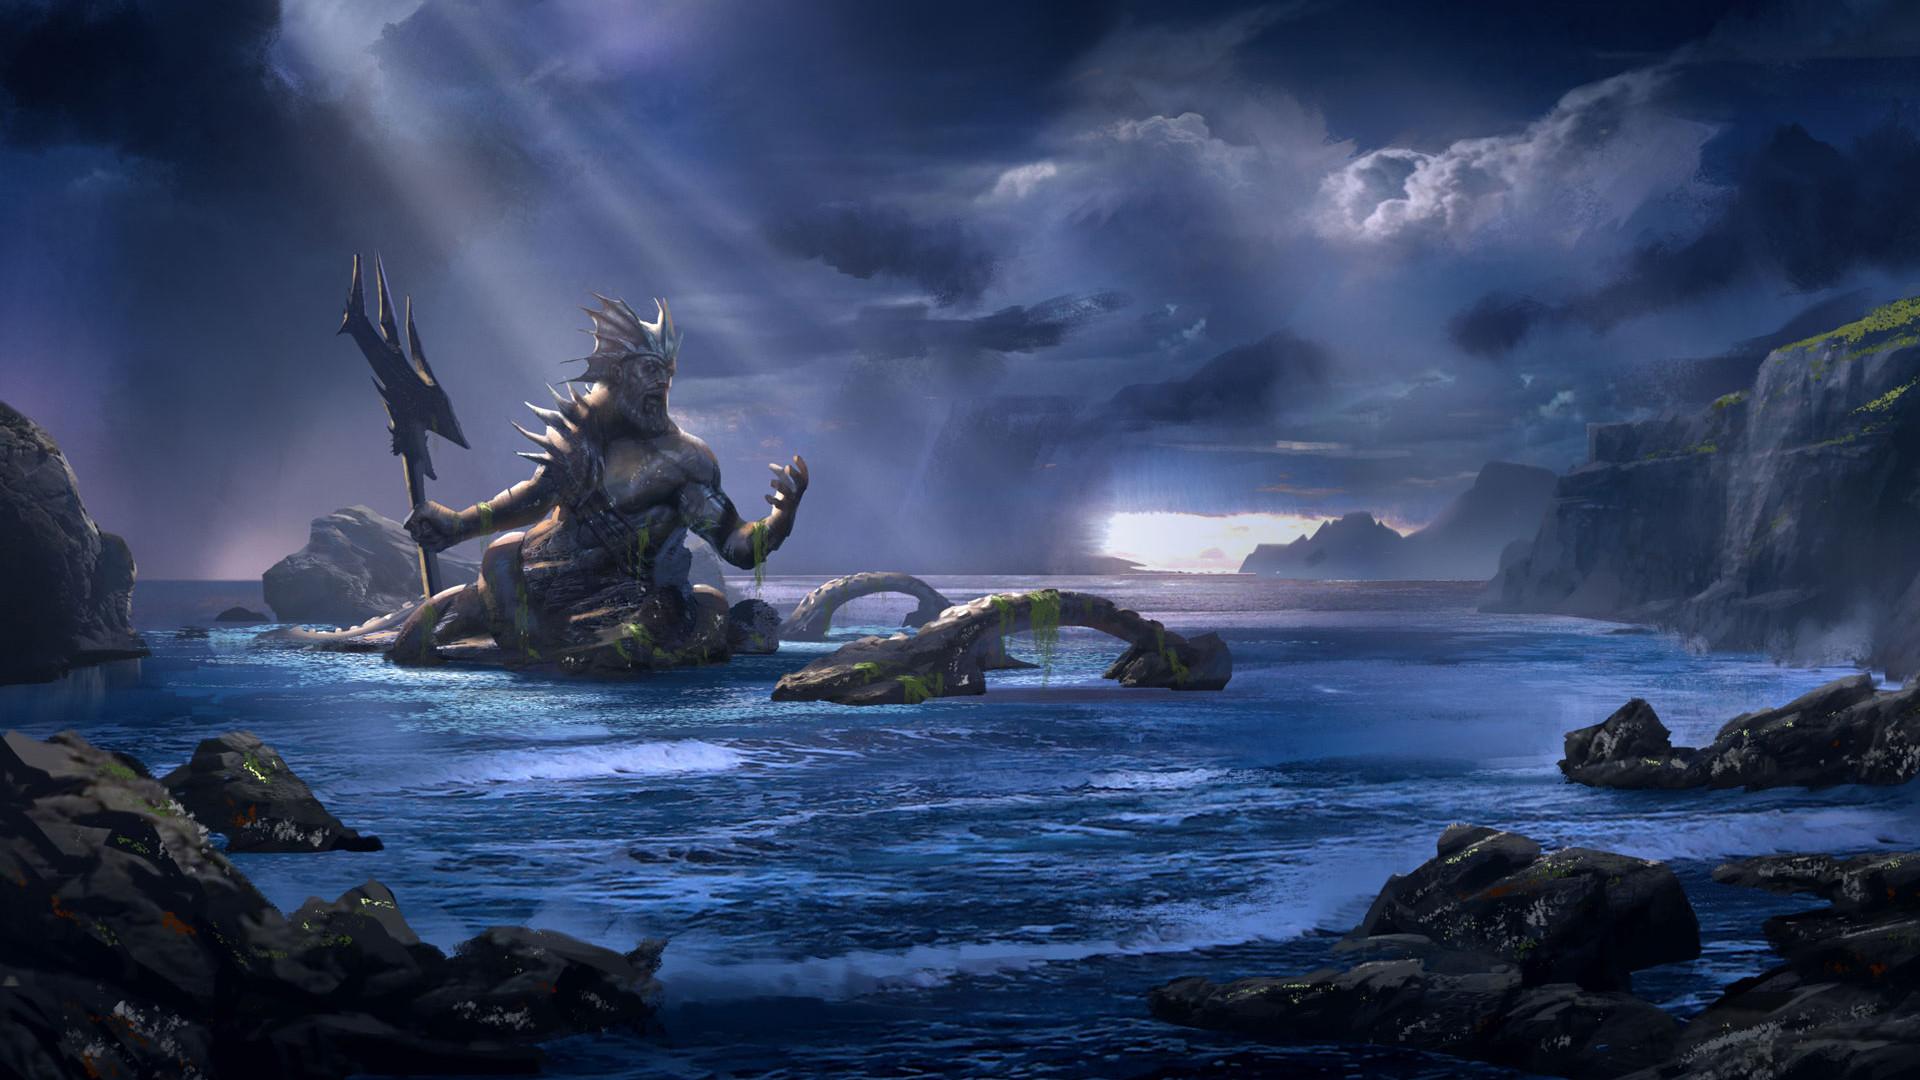 Lord Shiva Dangerous Image Hd 1080p Hd Wallpapers For Pc 1920x1080 Download Hd Wallpaper Wallpapertip